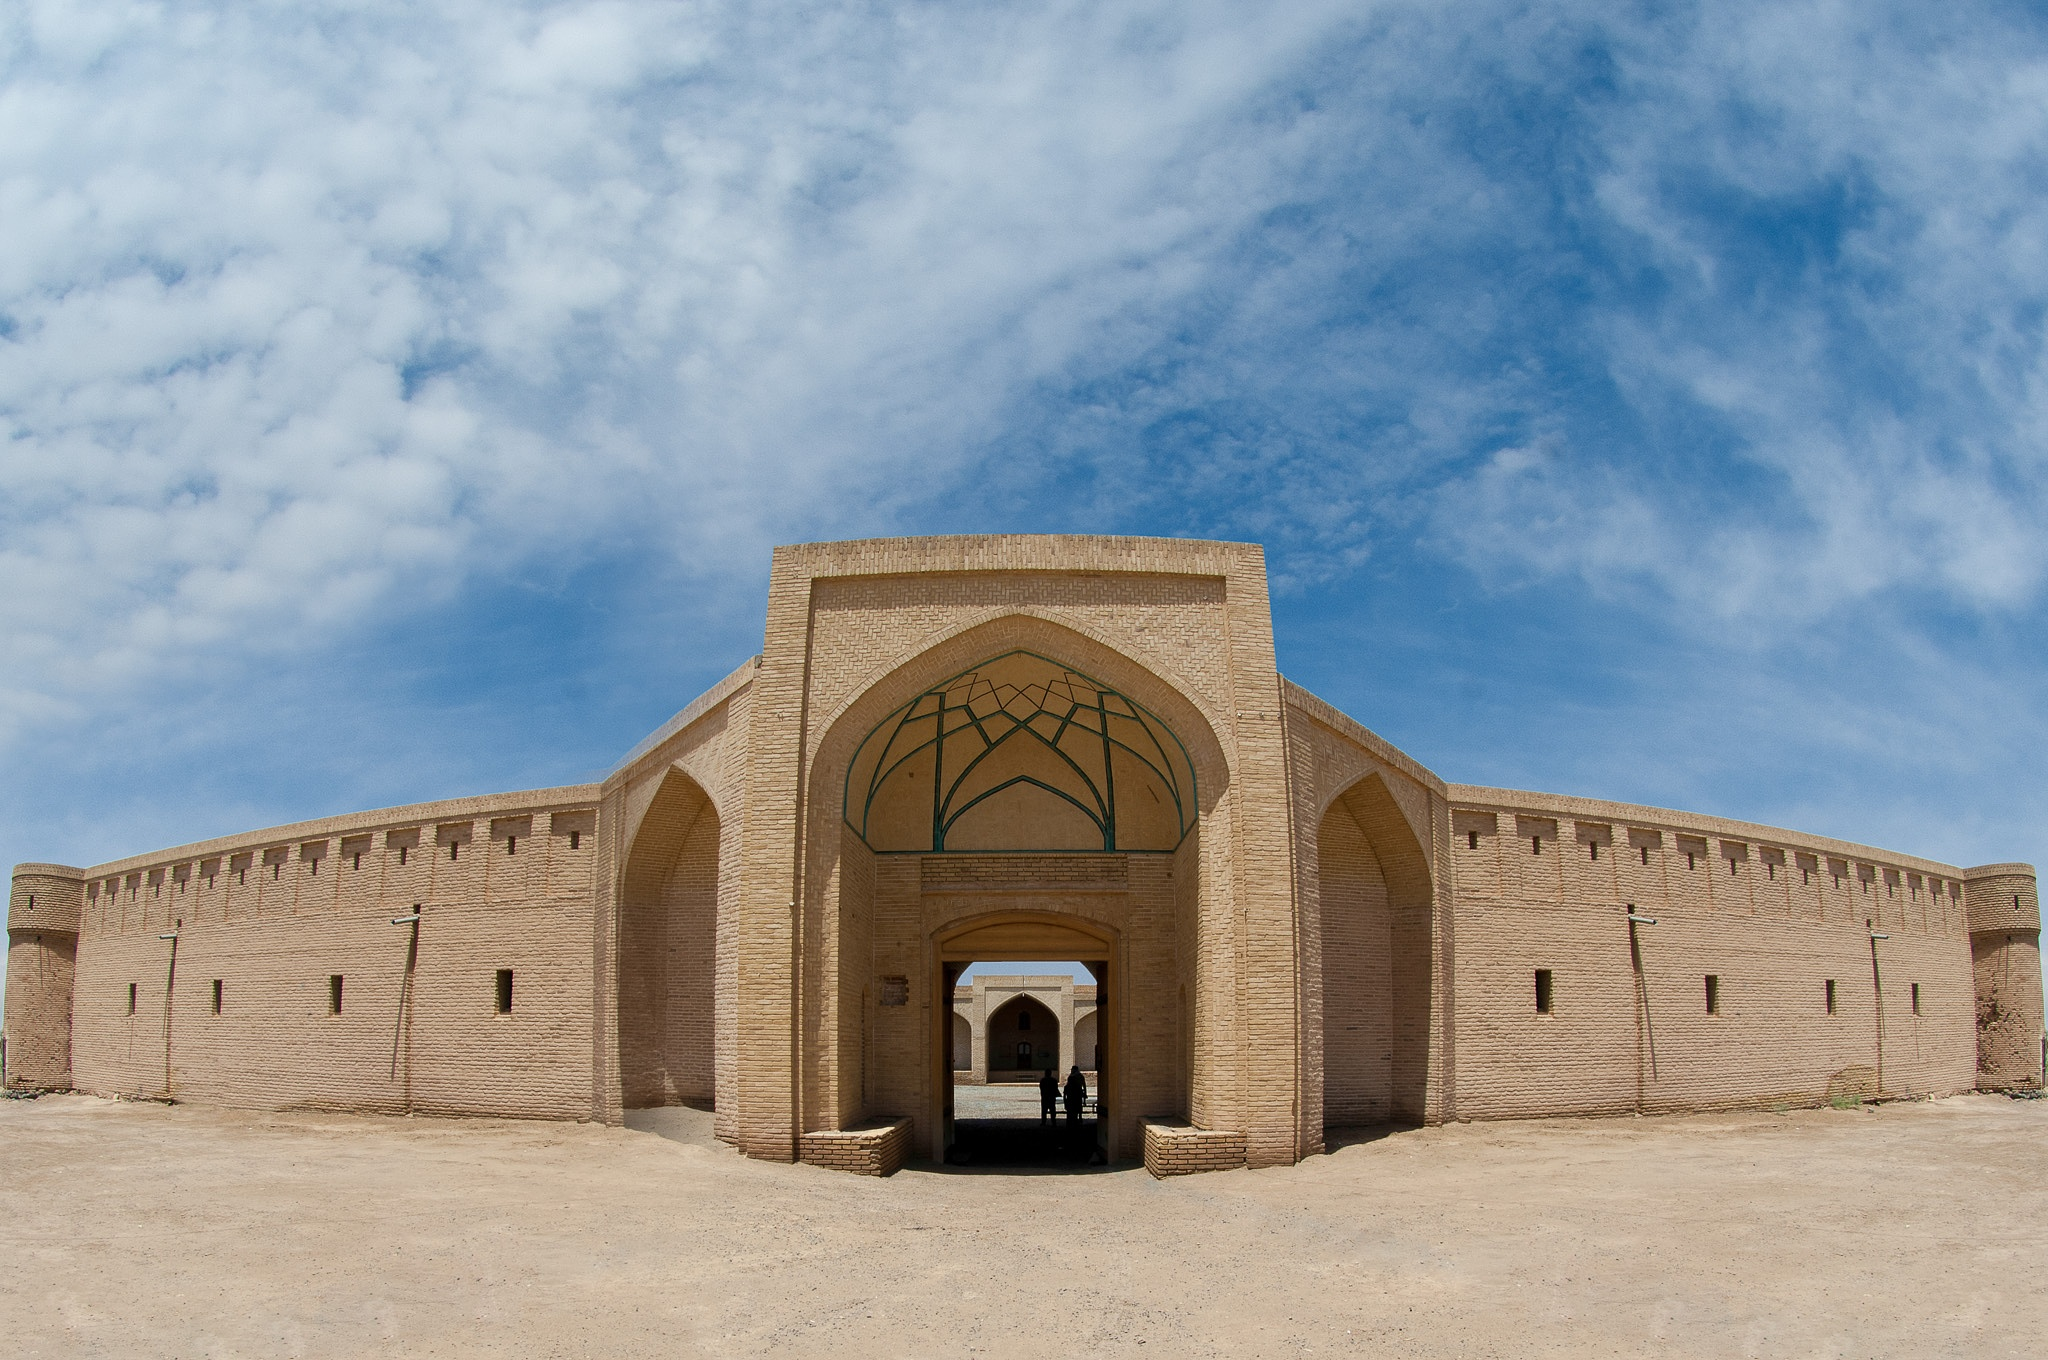 Maranjab Caravansaray by Mehrdad Bathaee